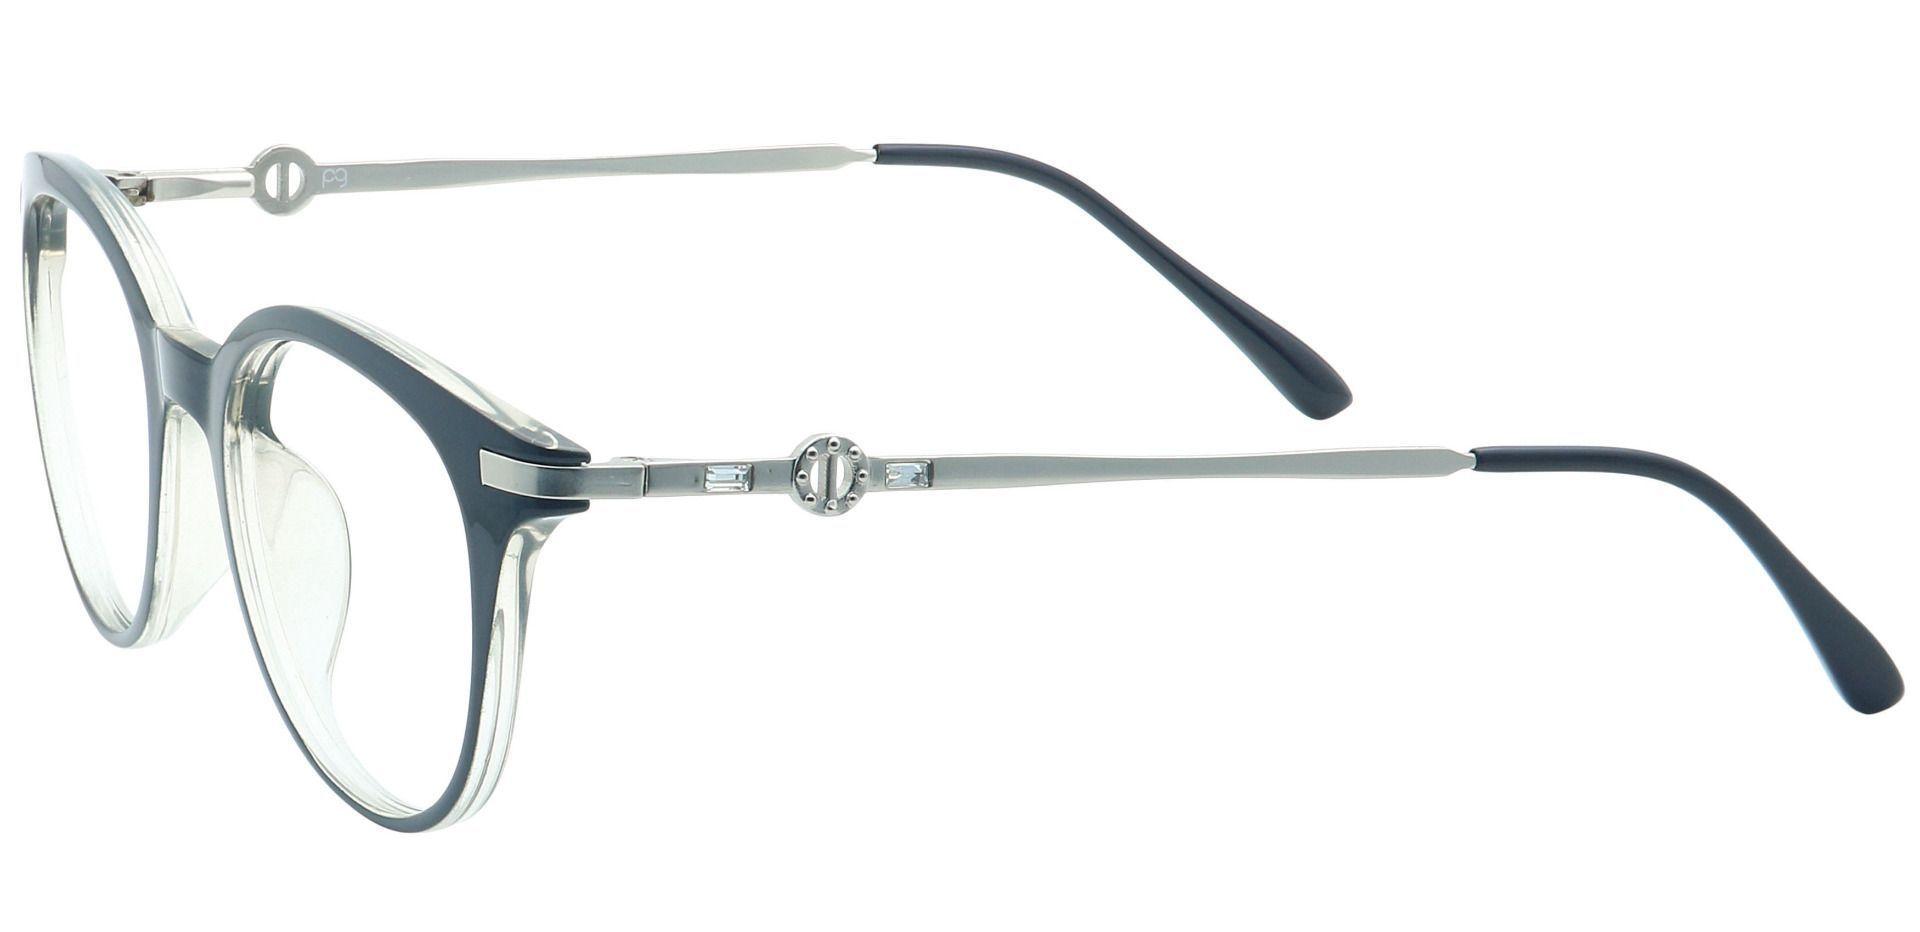 Penny Oval Lined Bifocal Glasses - Black